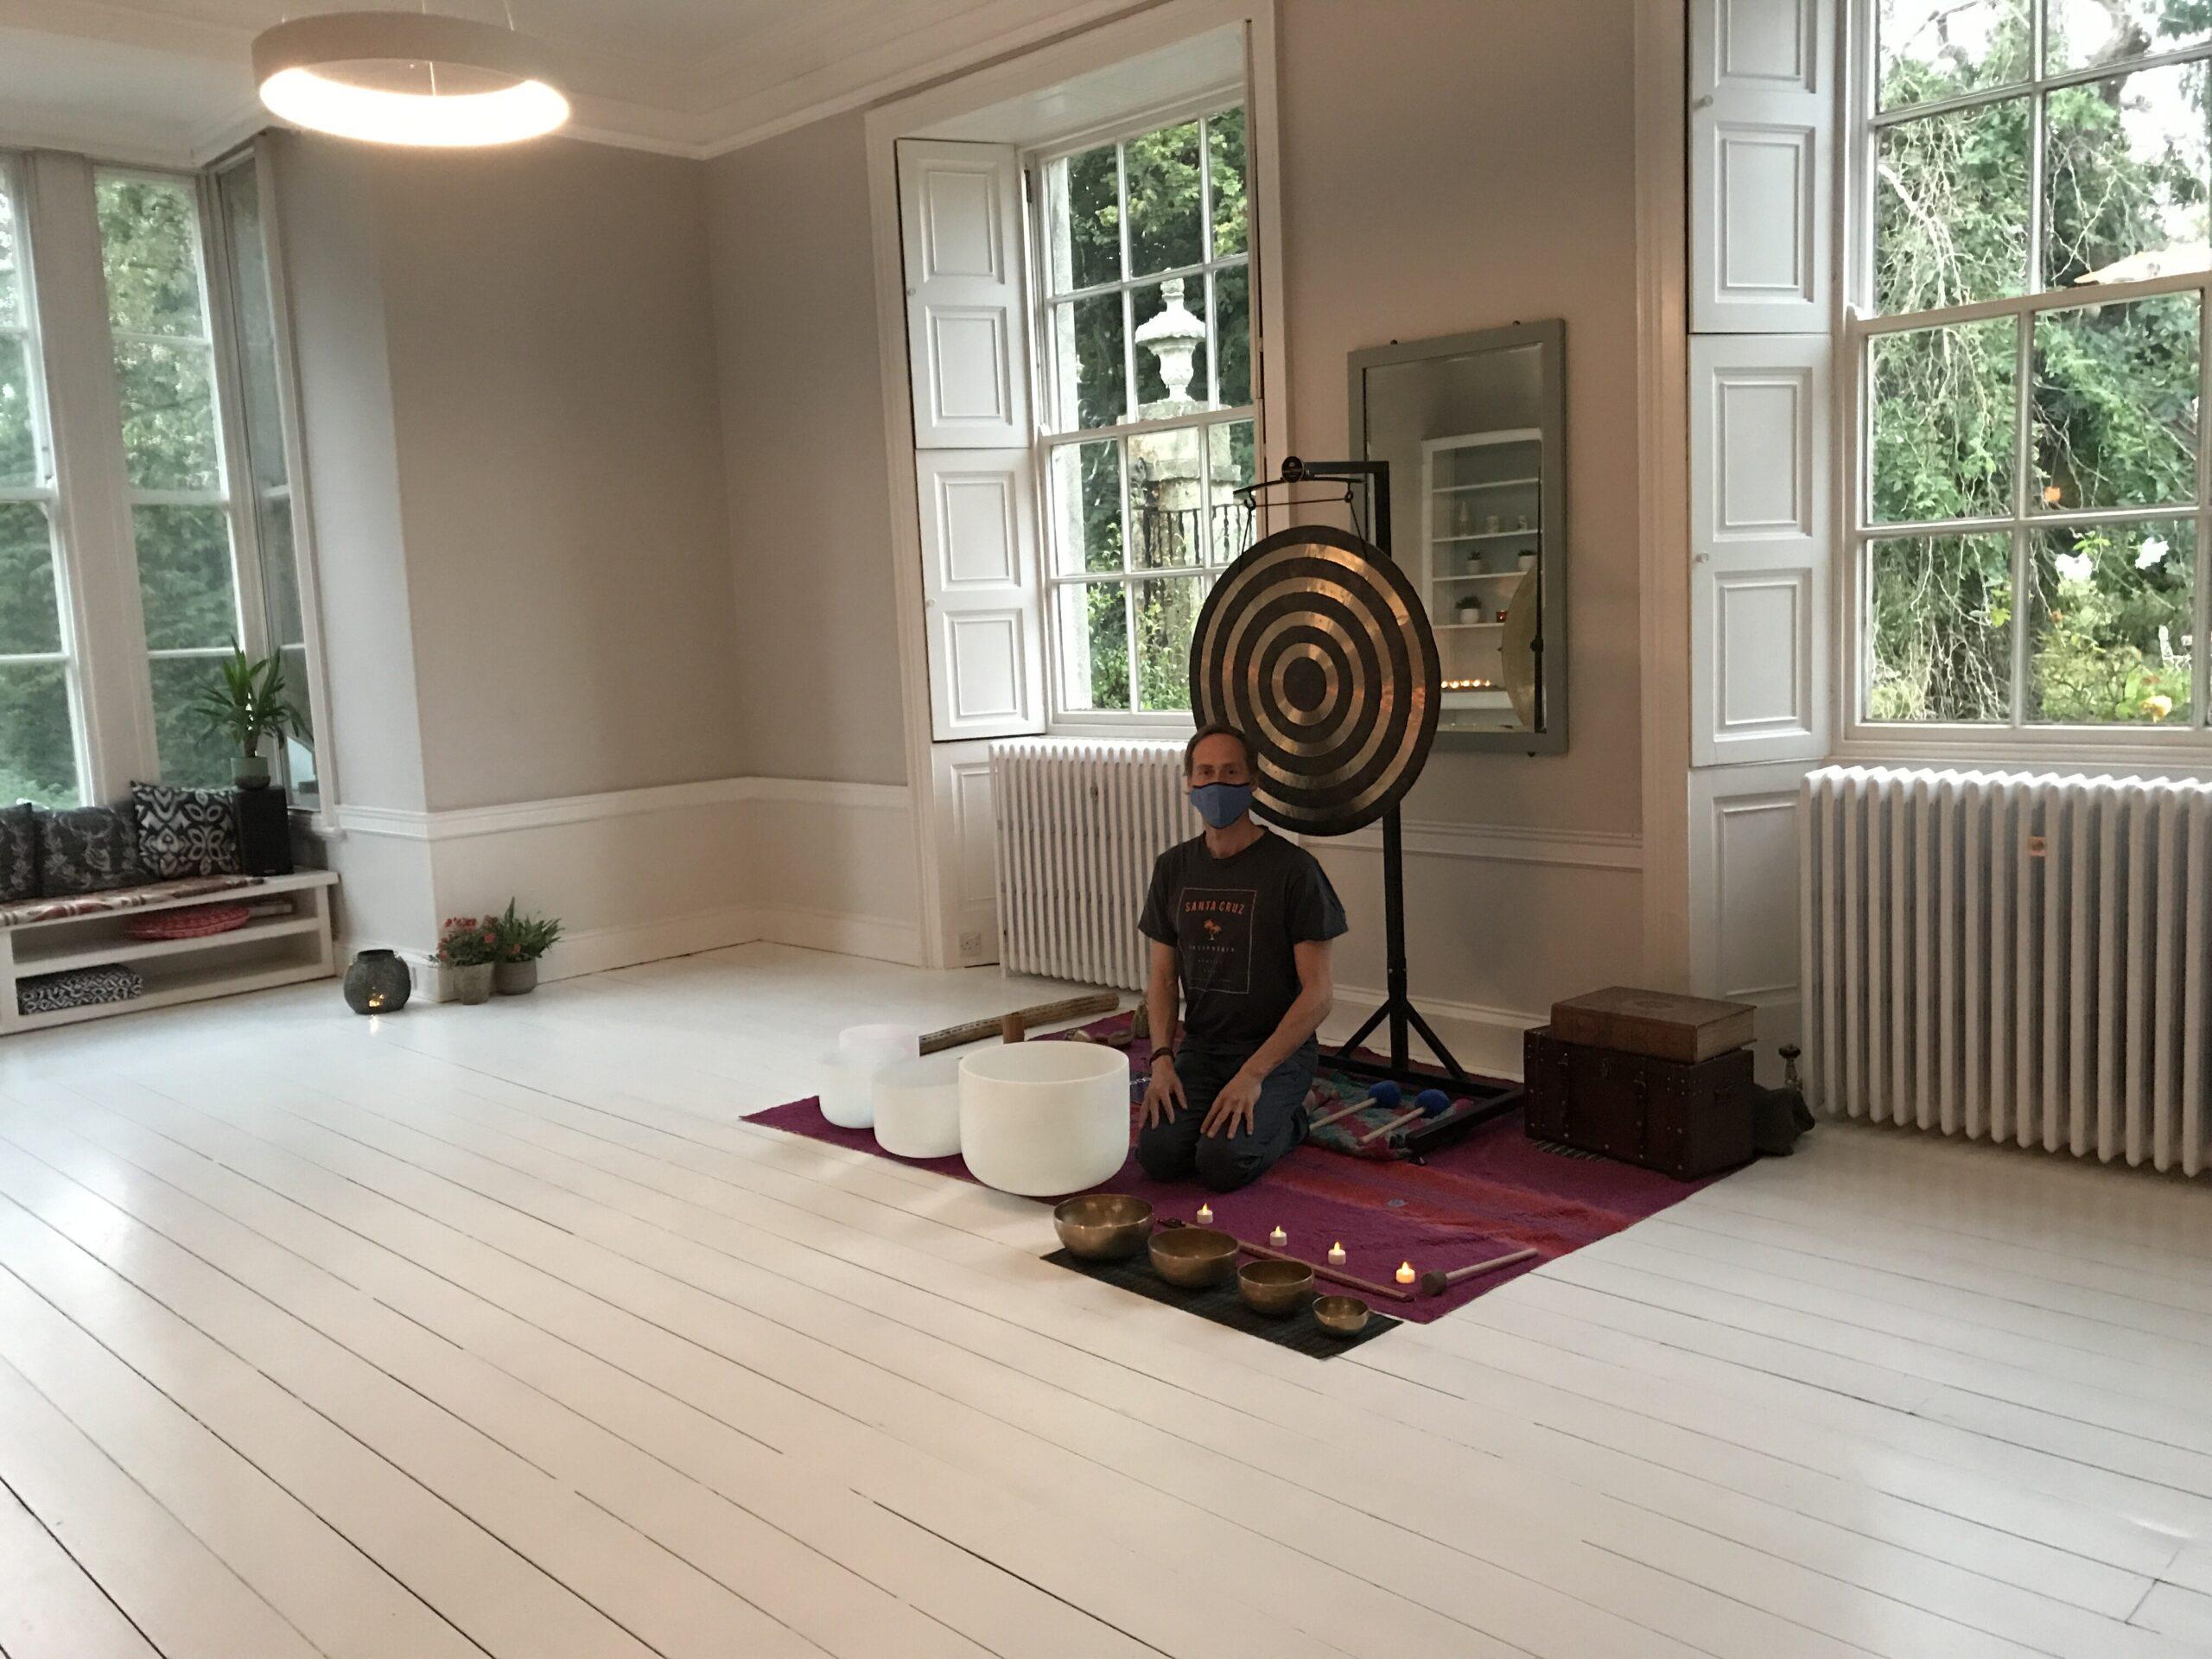 Soundbath at YogaSpace Yorkshire